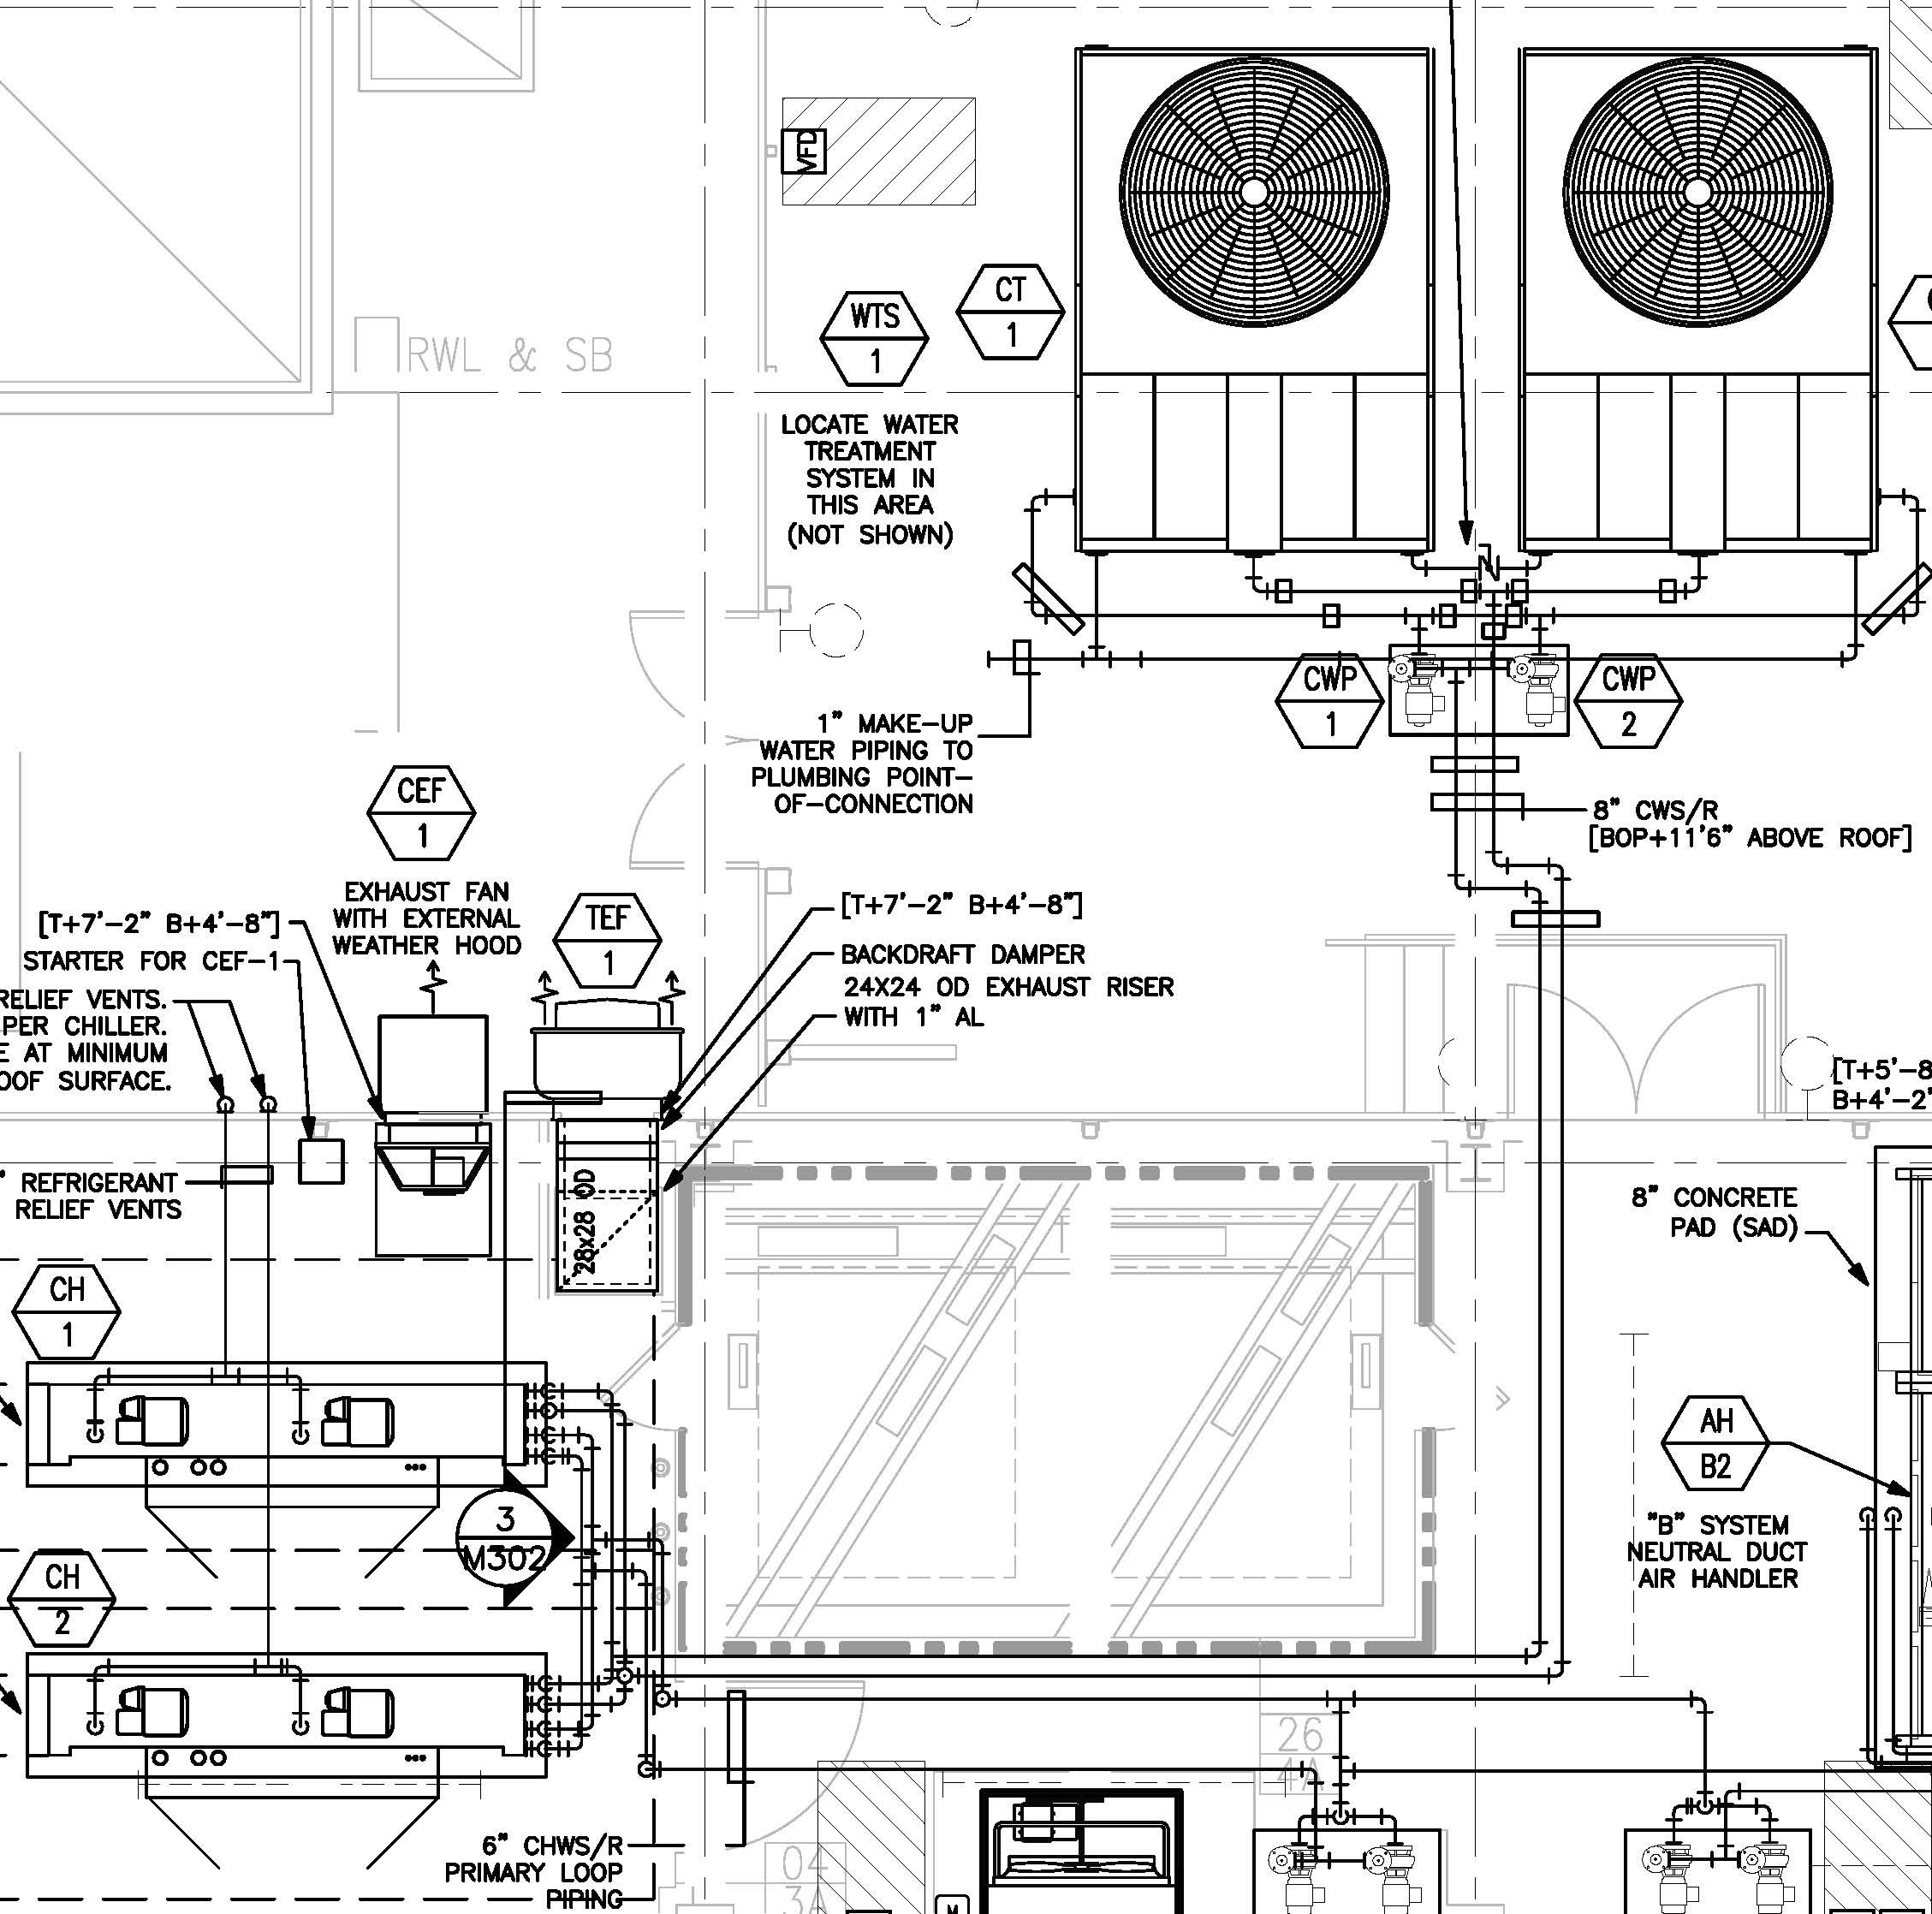 Hvac Control Panel Wiring Diagram Gallery Wiring Diagram Sample Basic Heat  Pump Wiring Diagram Hvac Panel Wiring